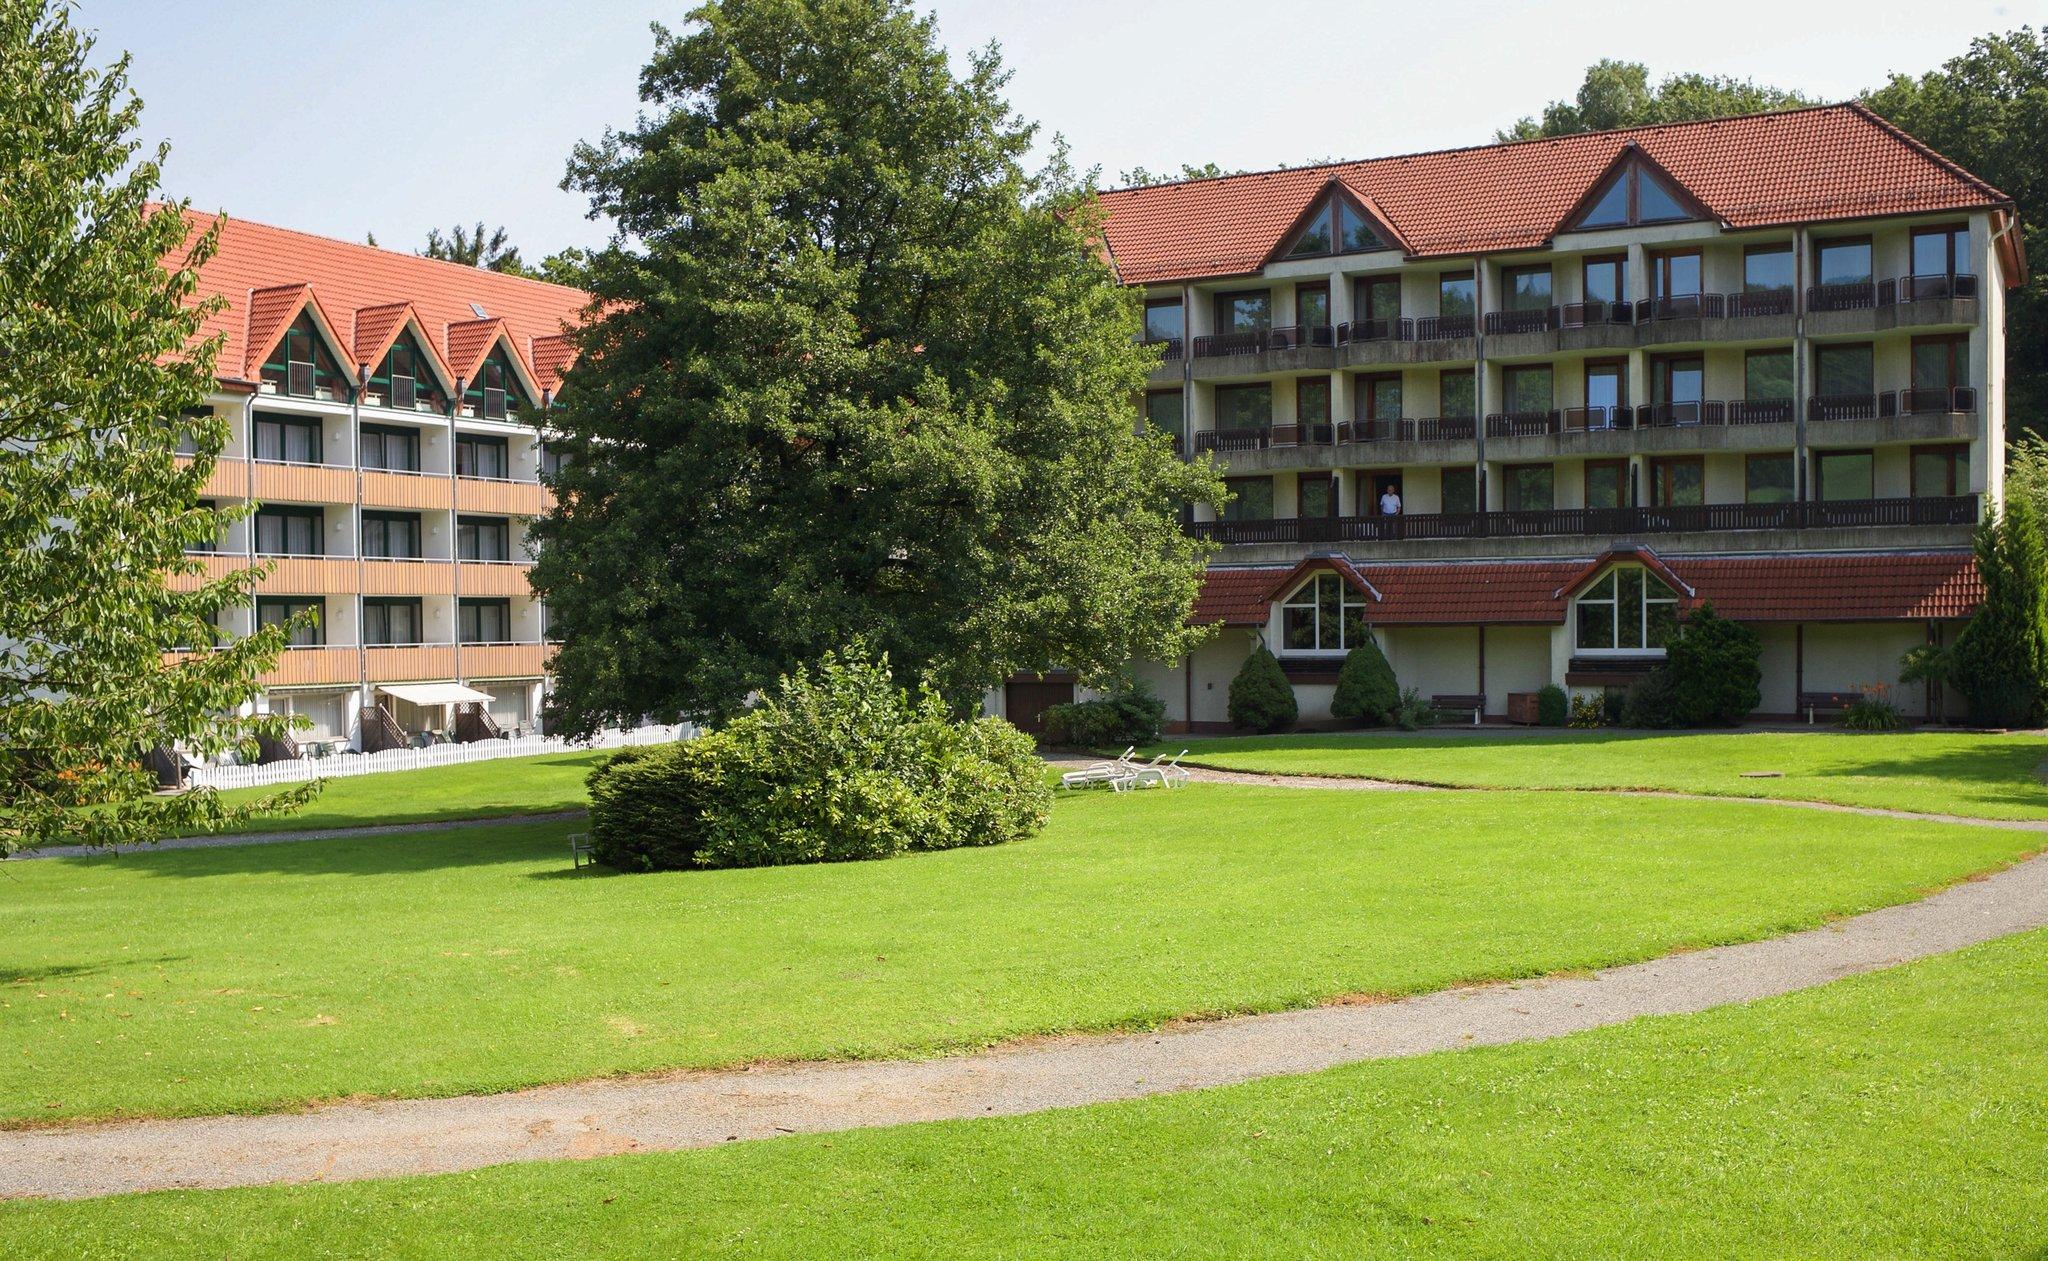 Ringhotel Waldhotel Baerenstein